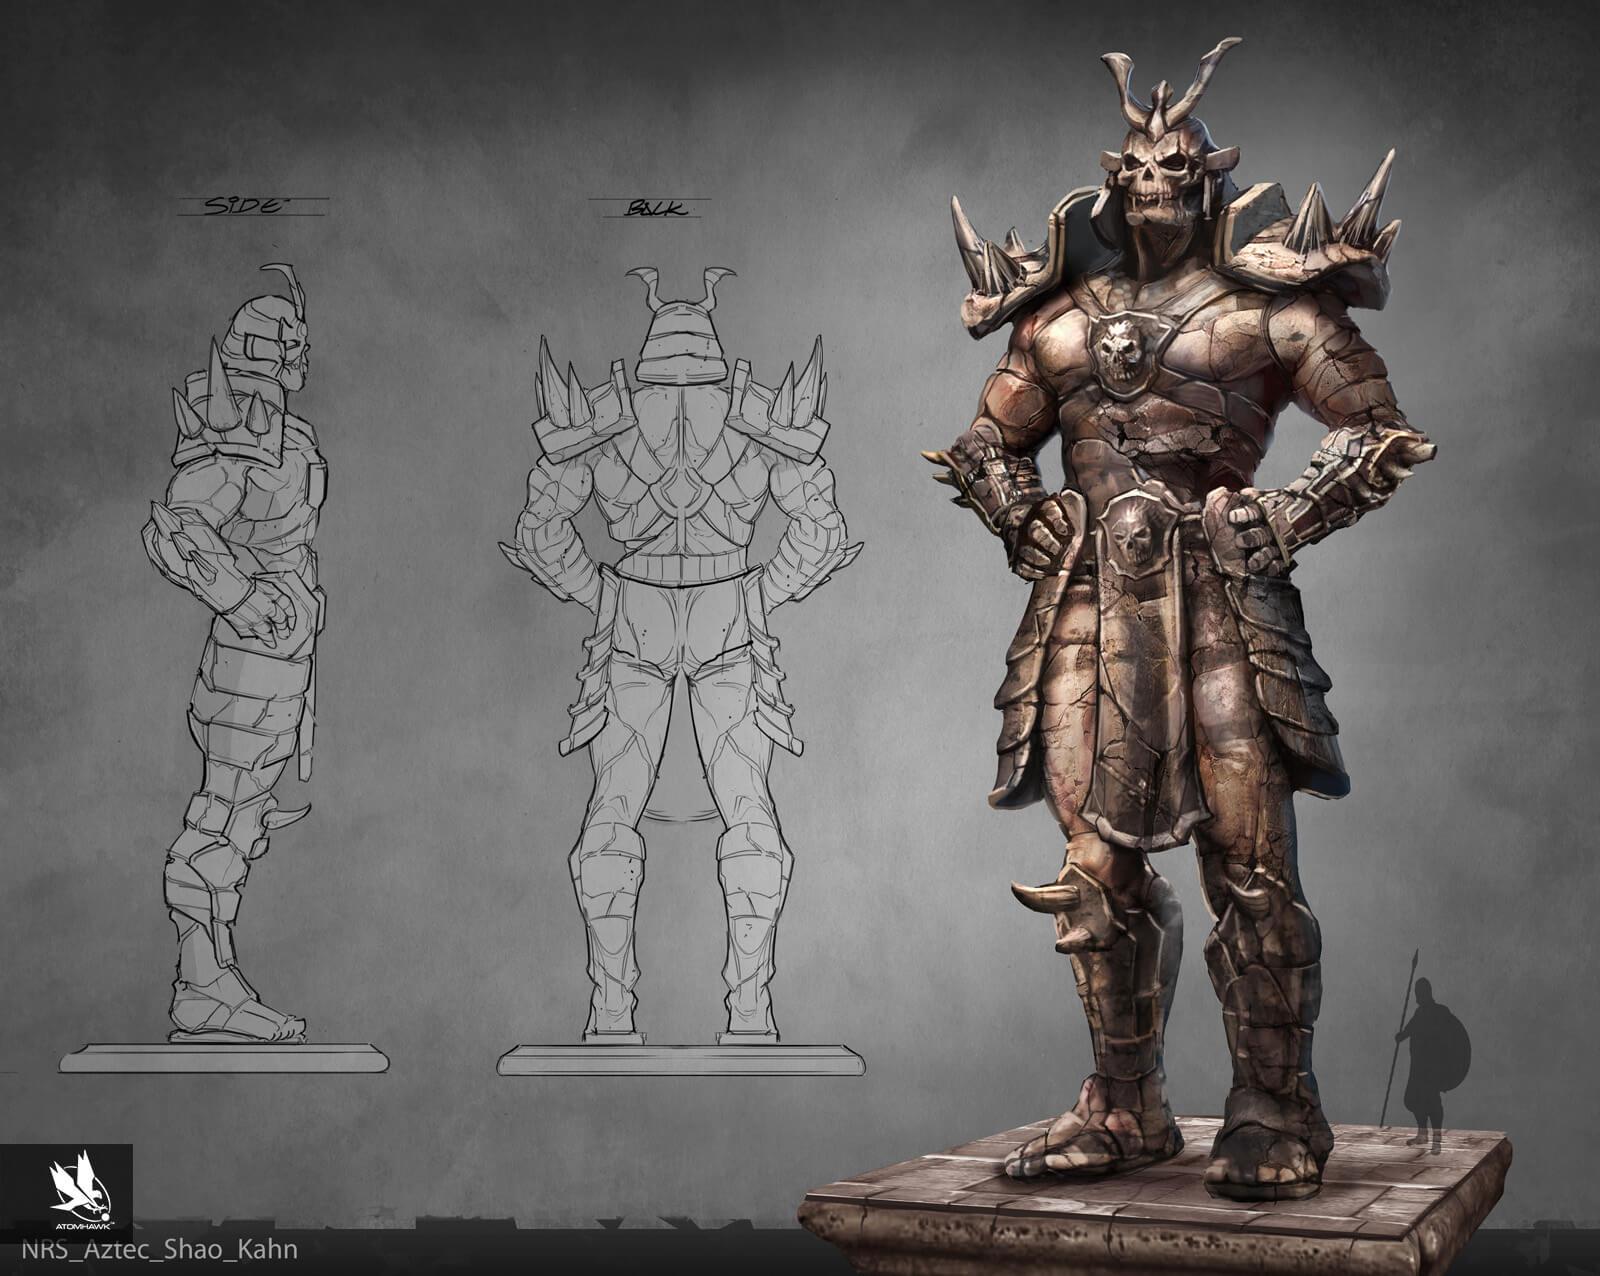 Atomhawk - Mortal Kombat X - Prop Design - Aztec Shap Kahn